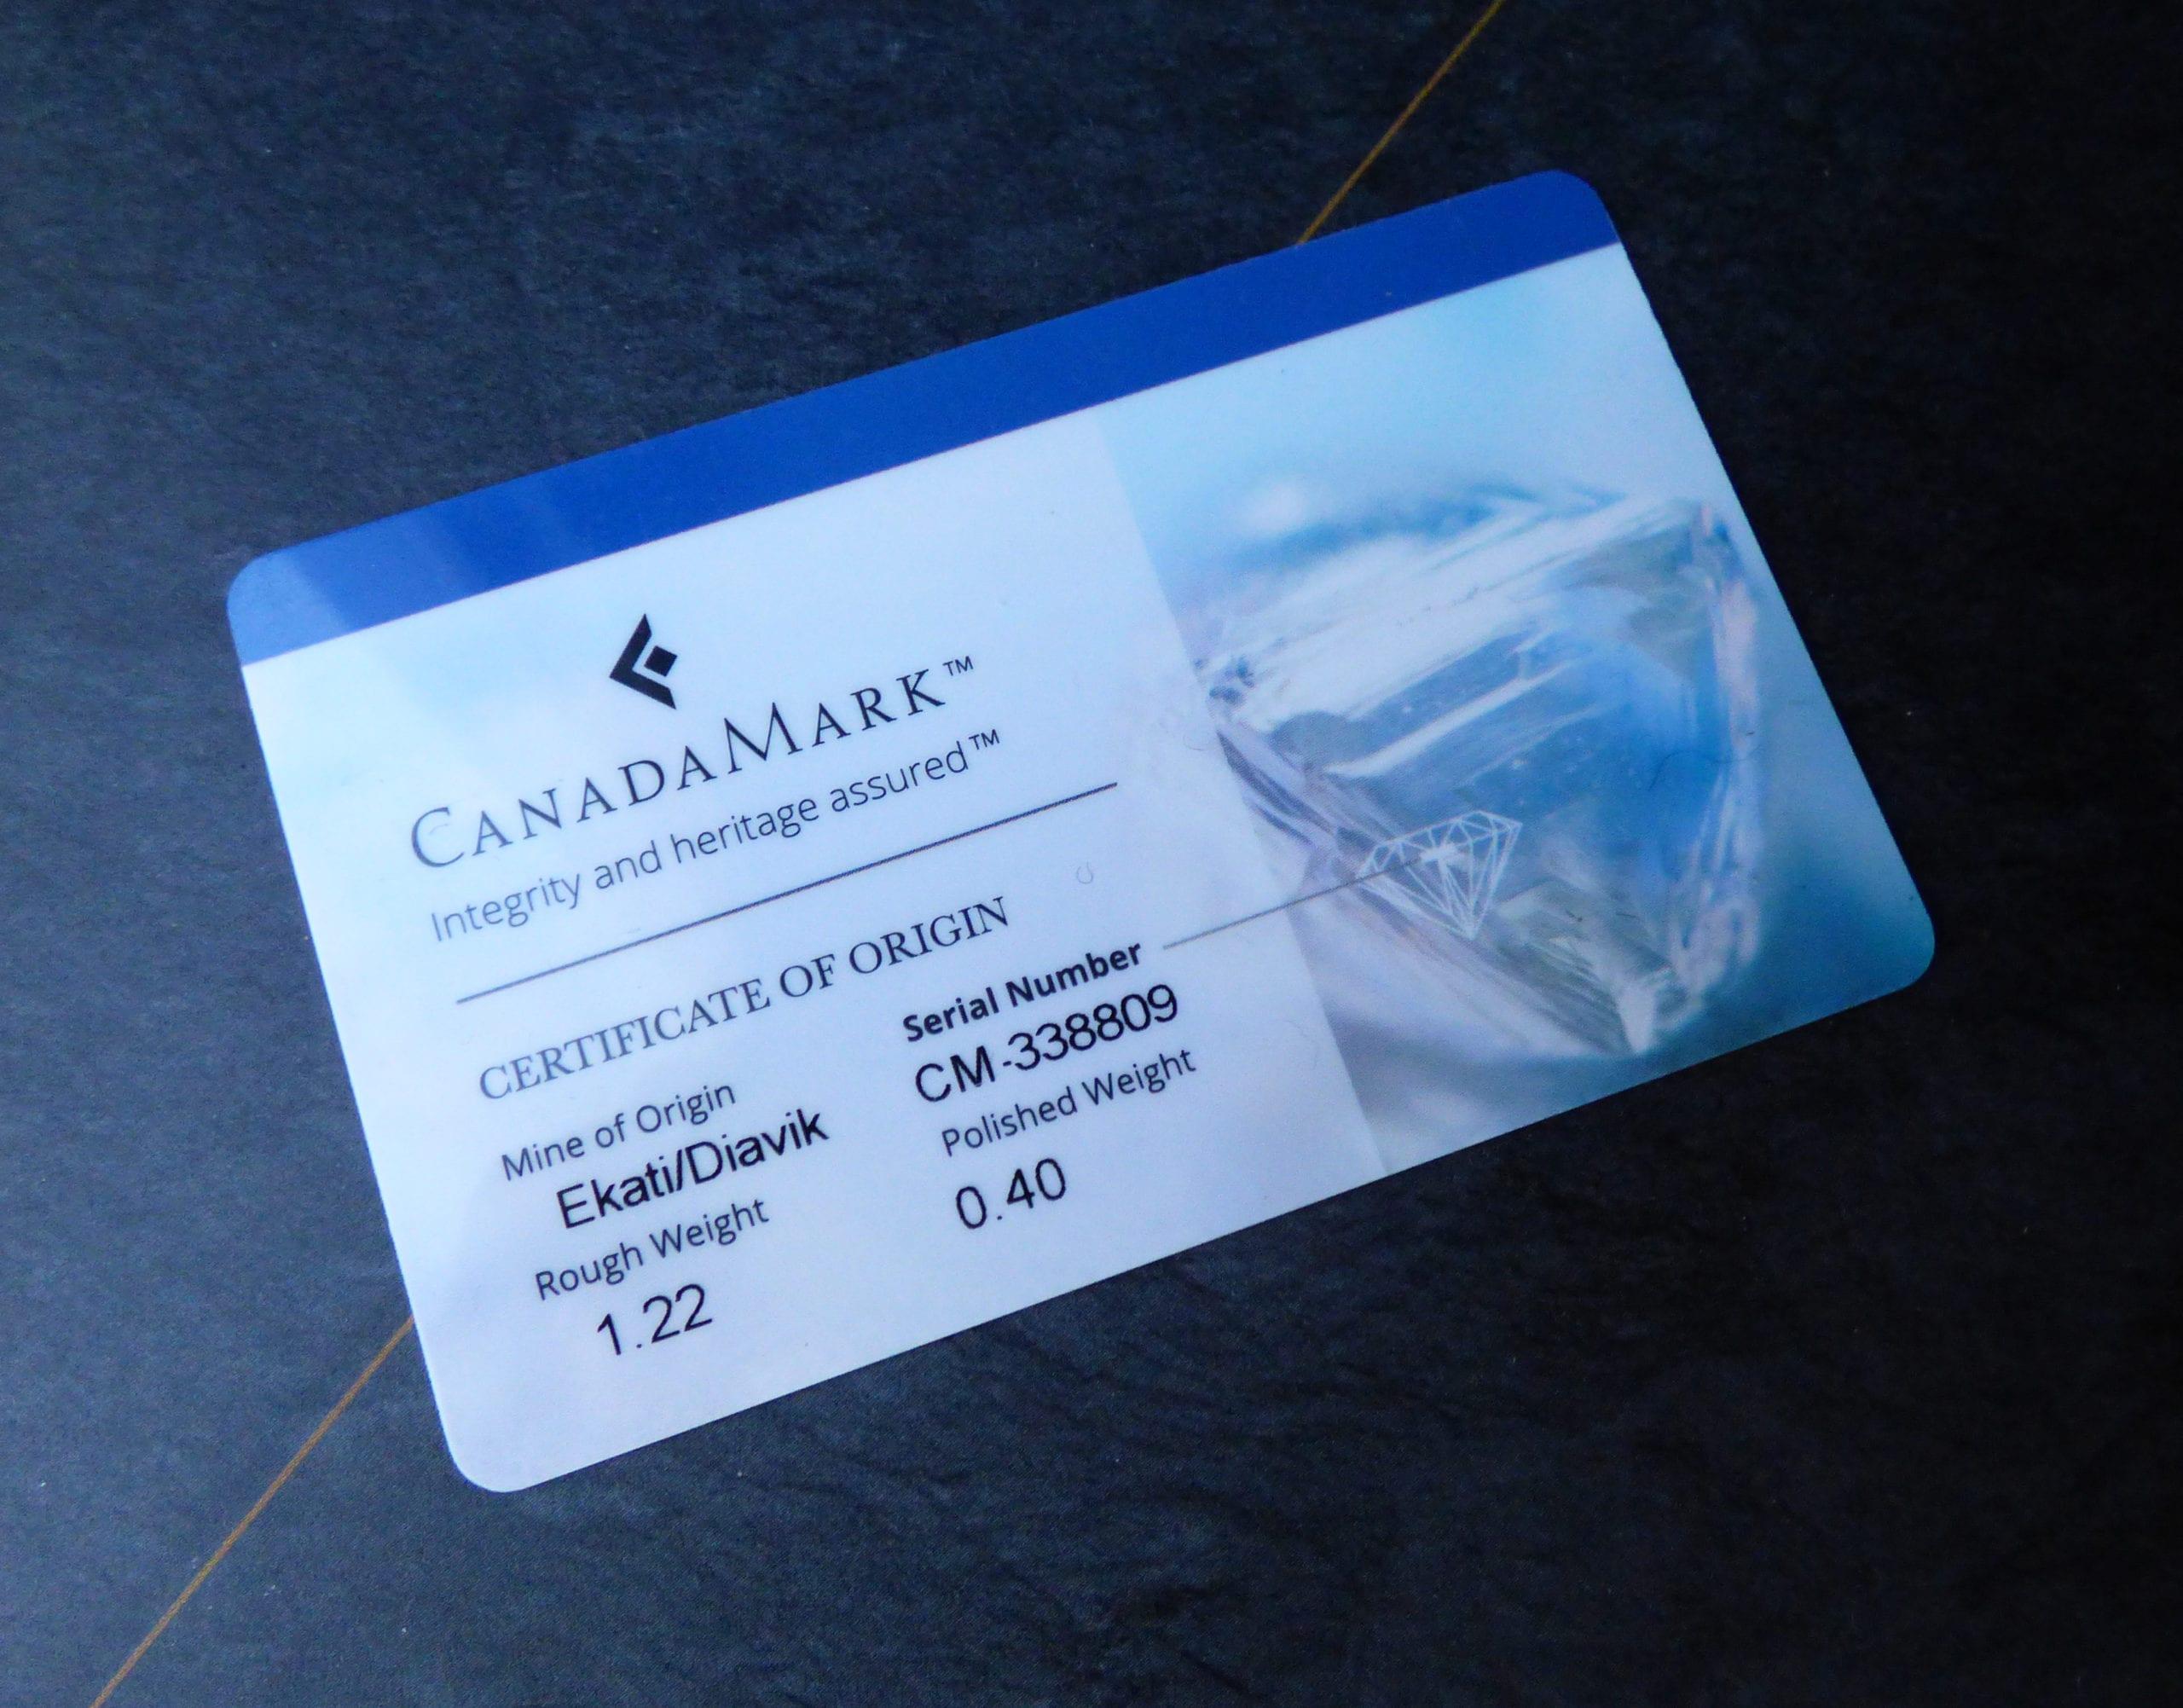 canadamark certification card